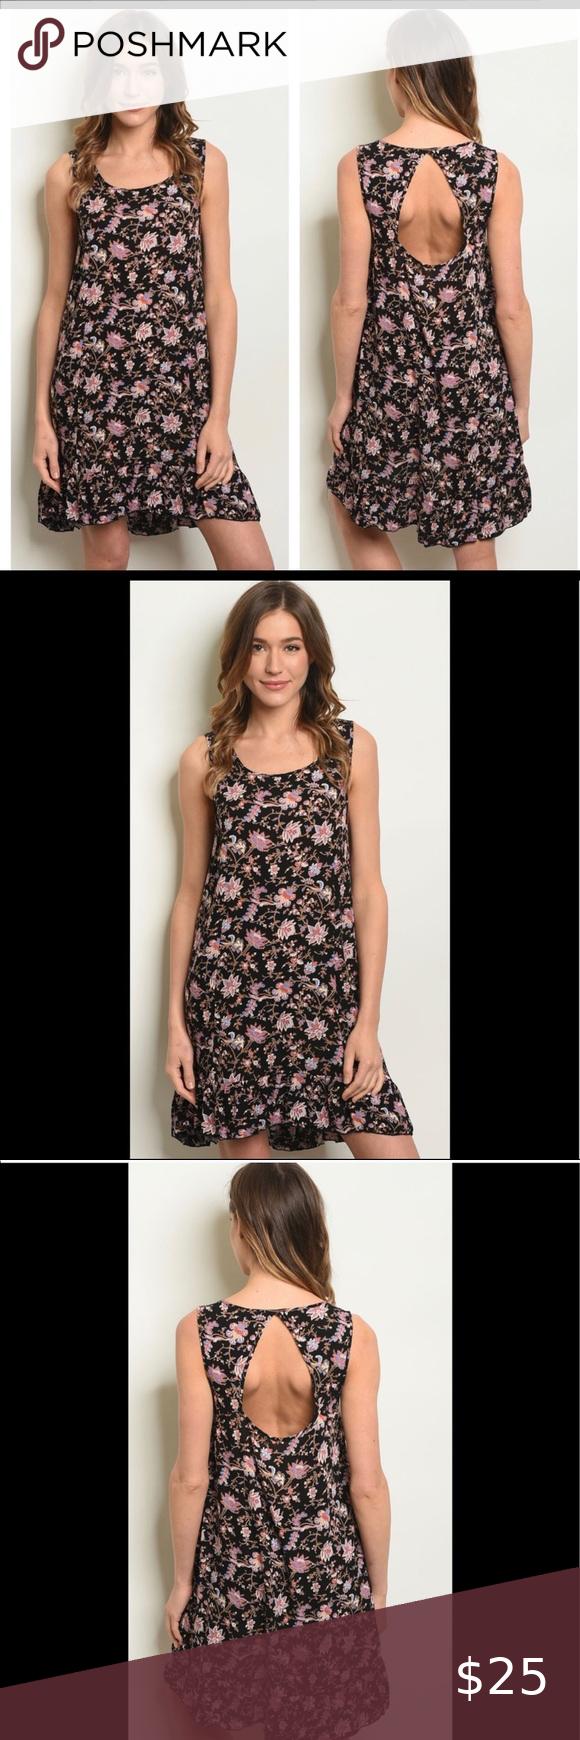 New Floral Summer Sun Dress Floral Dress Black Cute Black Dress Floral Dress Summer [ 1740 x 580 Pixel ]